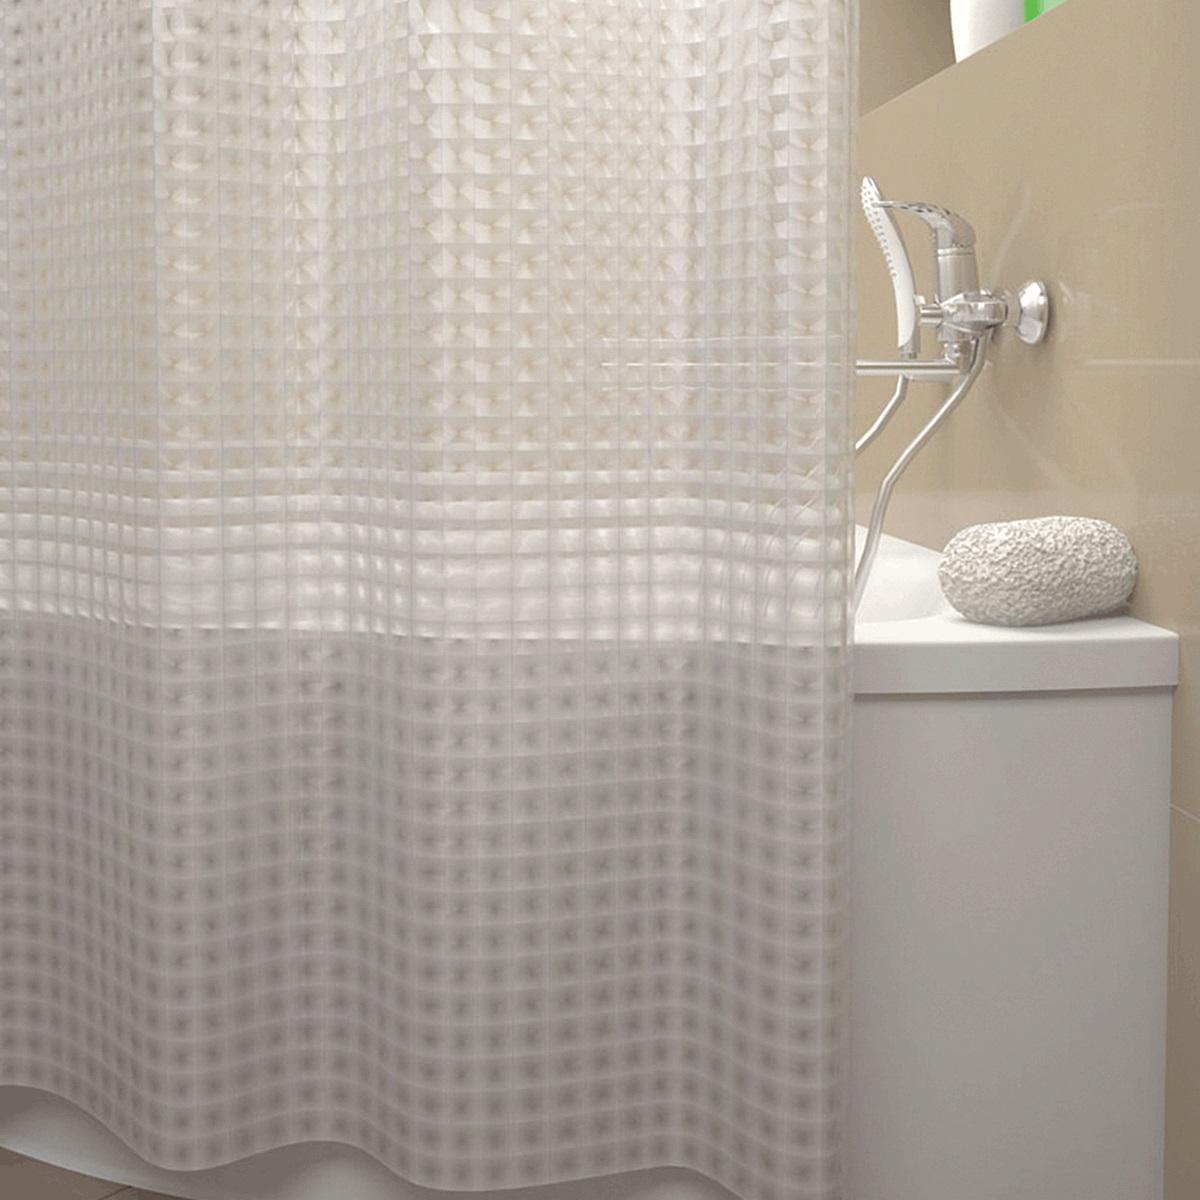 Штора для ванной Iddis Stereo Square, цвет: прозрачный, 180 x 200 см